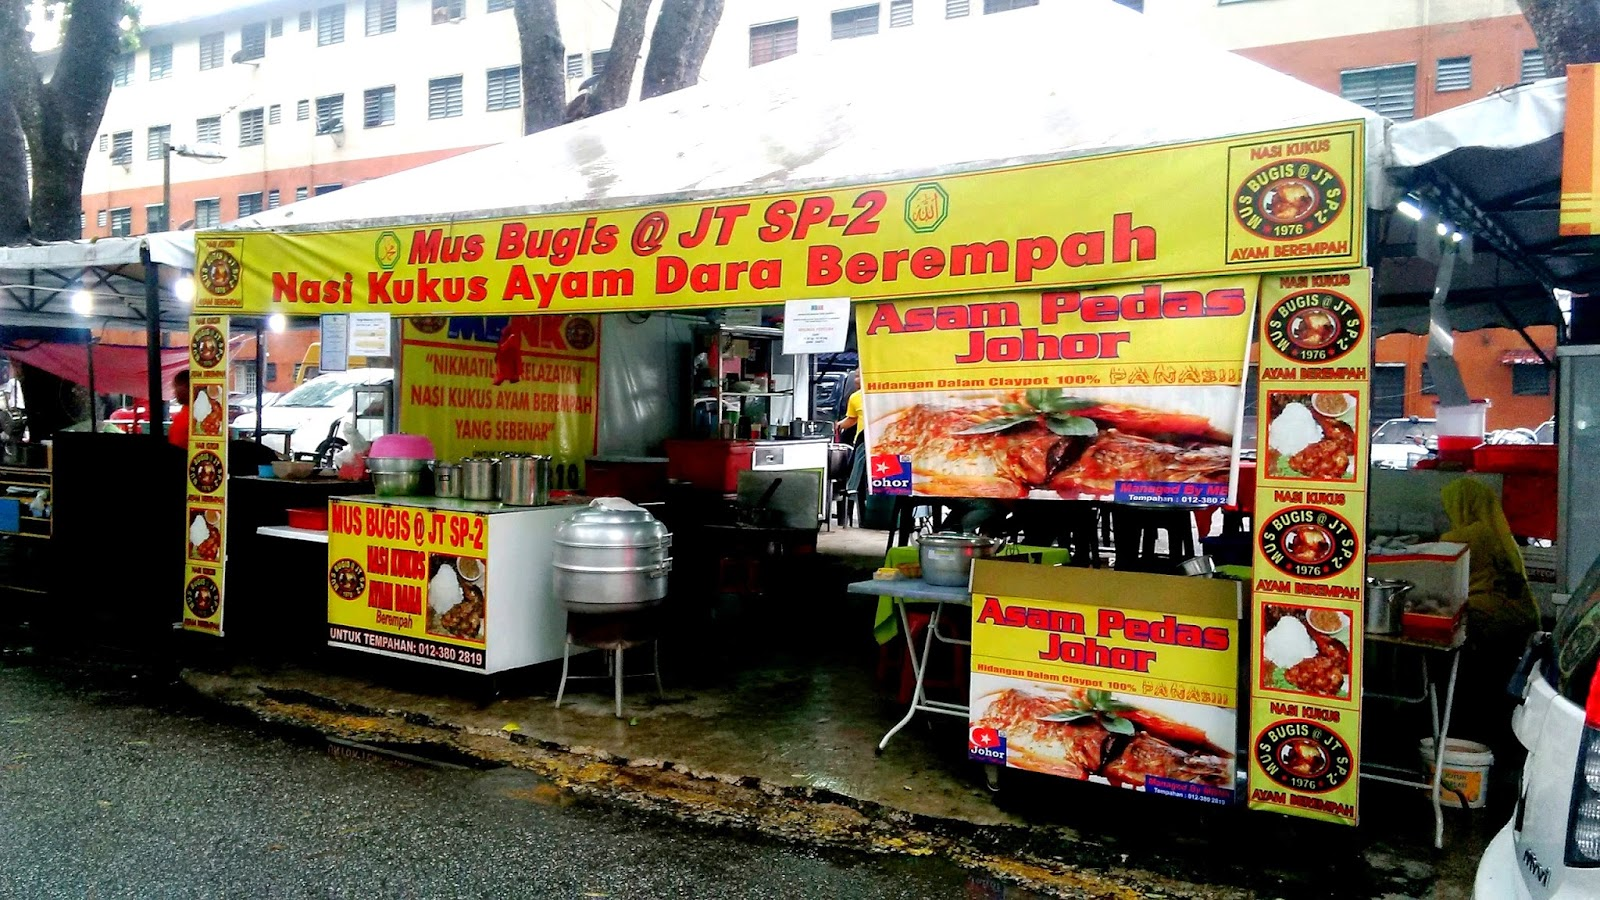 Mus Bugis Nasi Kukus(MBNK), Subang Perdana 2, Shah Alam.